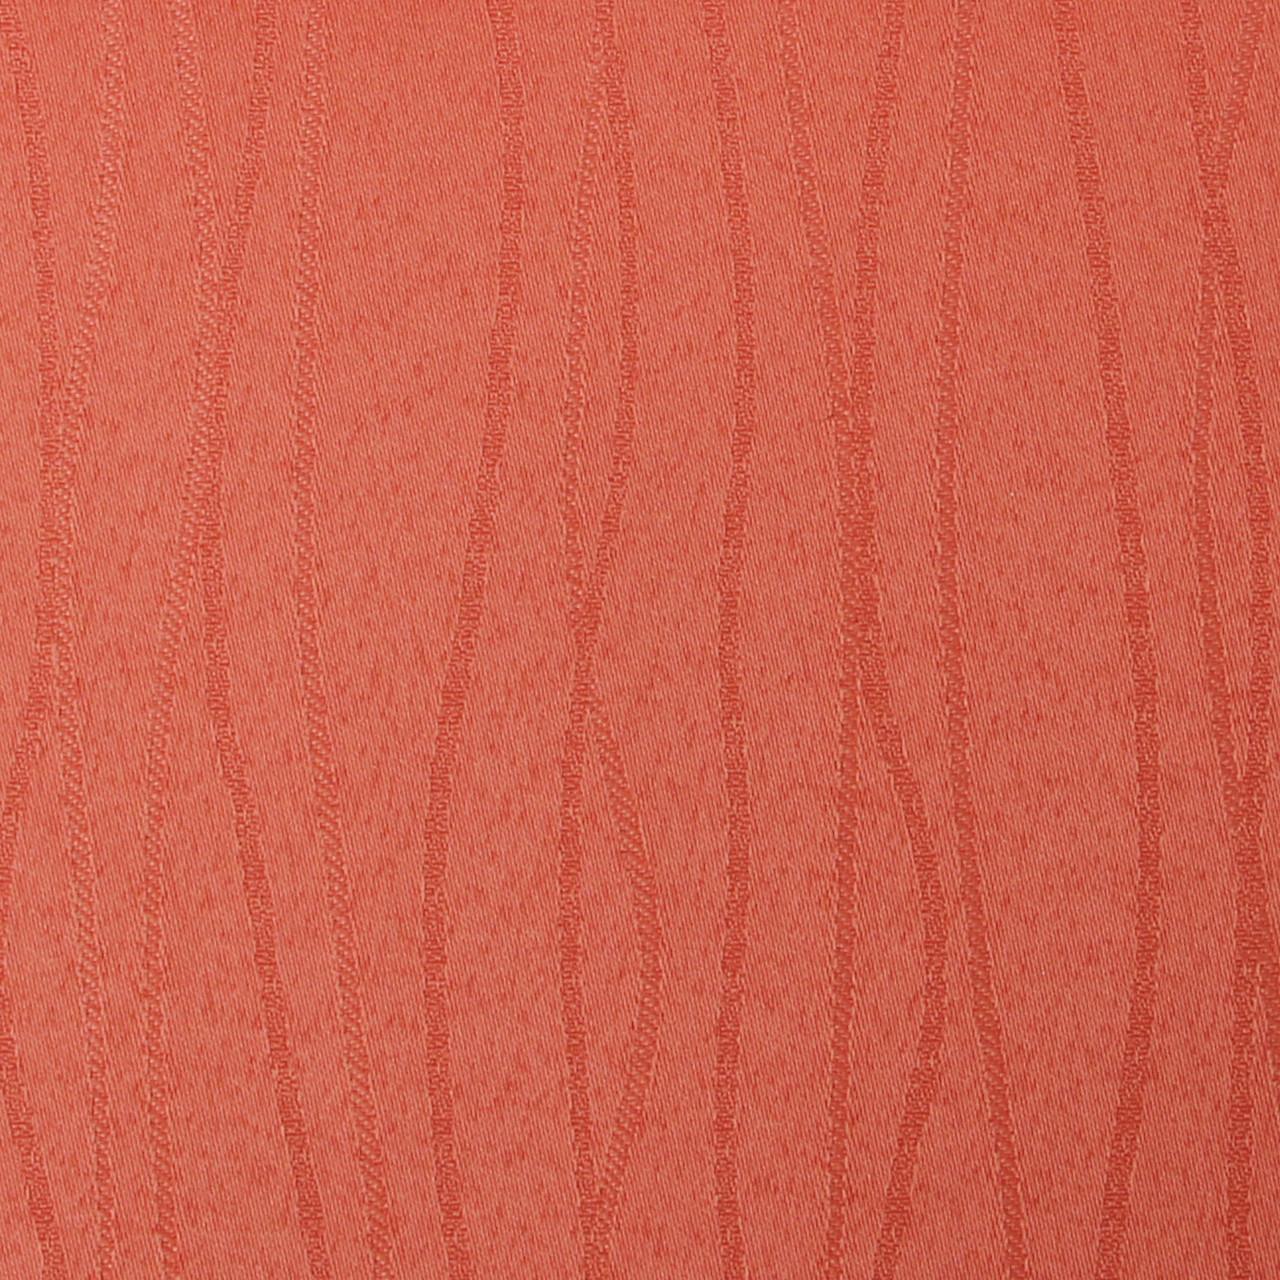 Рулонные шторы Ткань Grass Терракот 2095